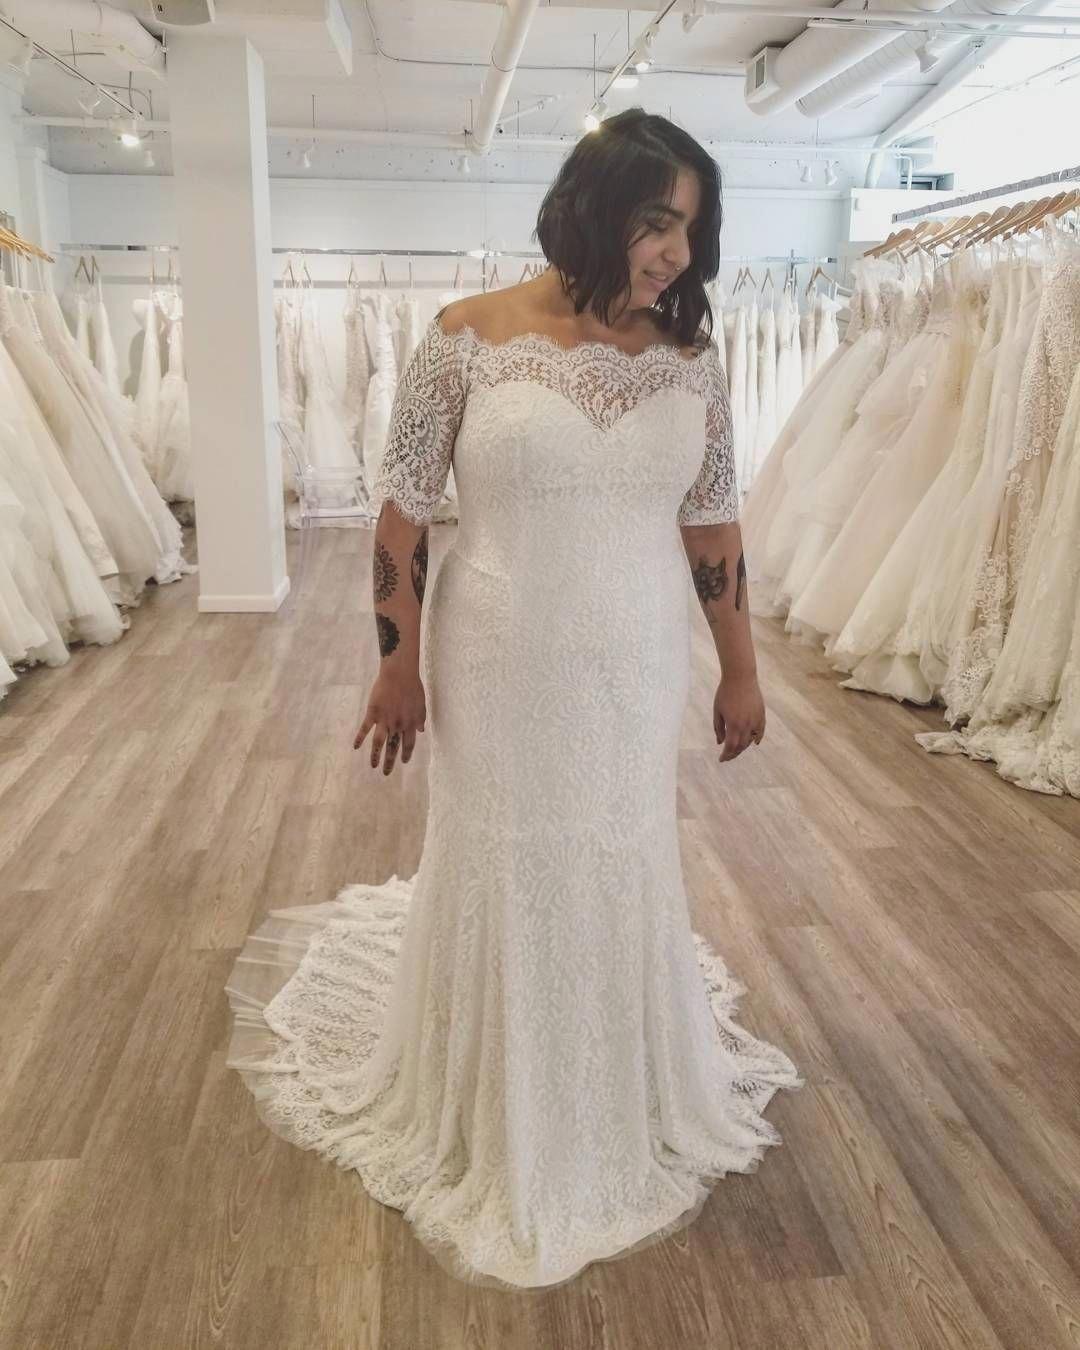 BEBA'S 10TH ANNIVERSARY Wedding Dress Vestidos de novia